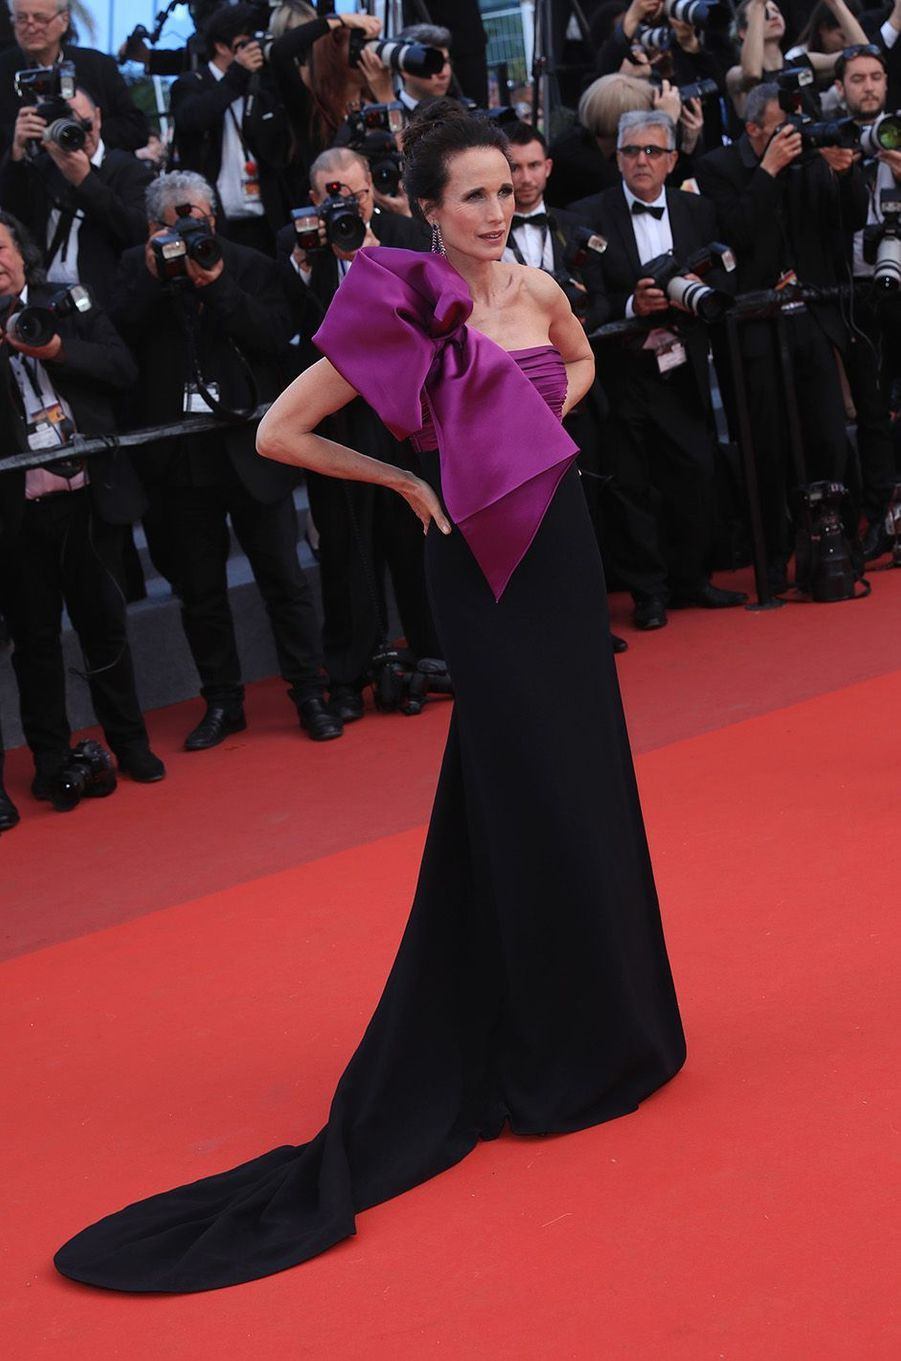 Andy MacDowellà Cannes, le 21 mai 2017.